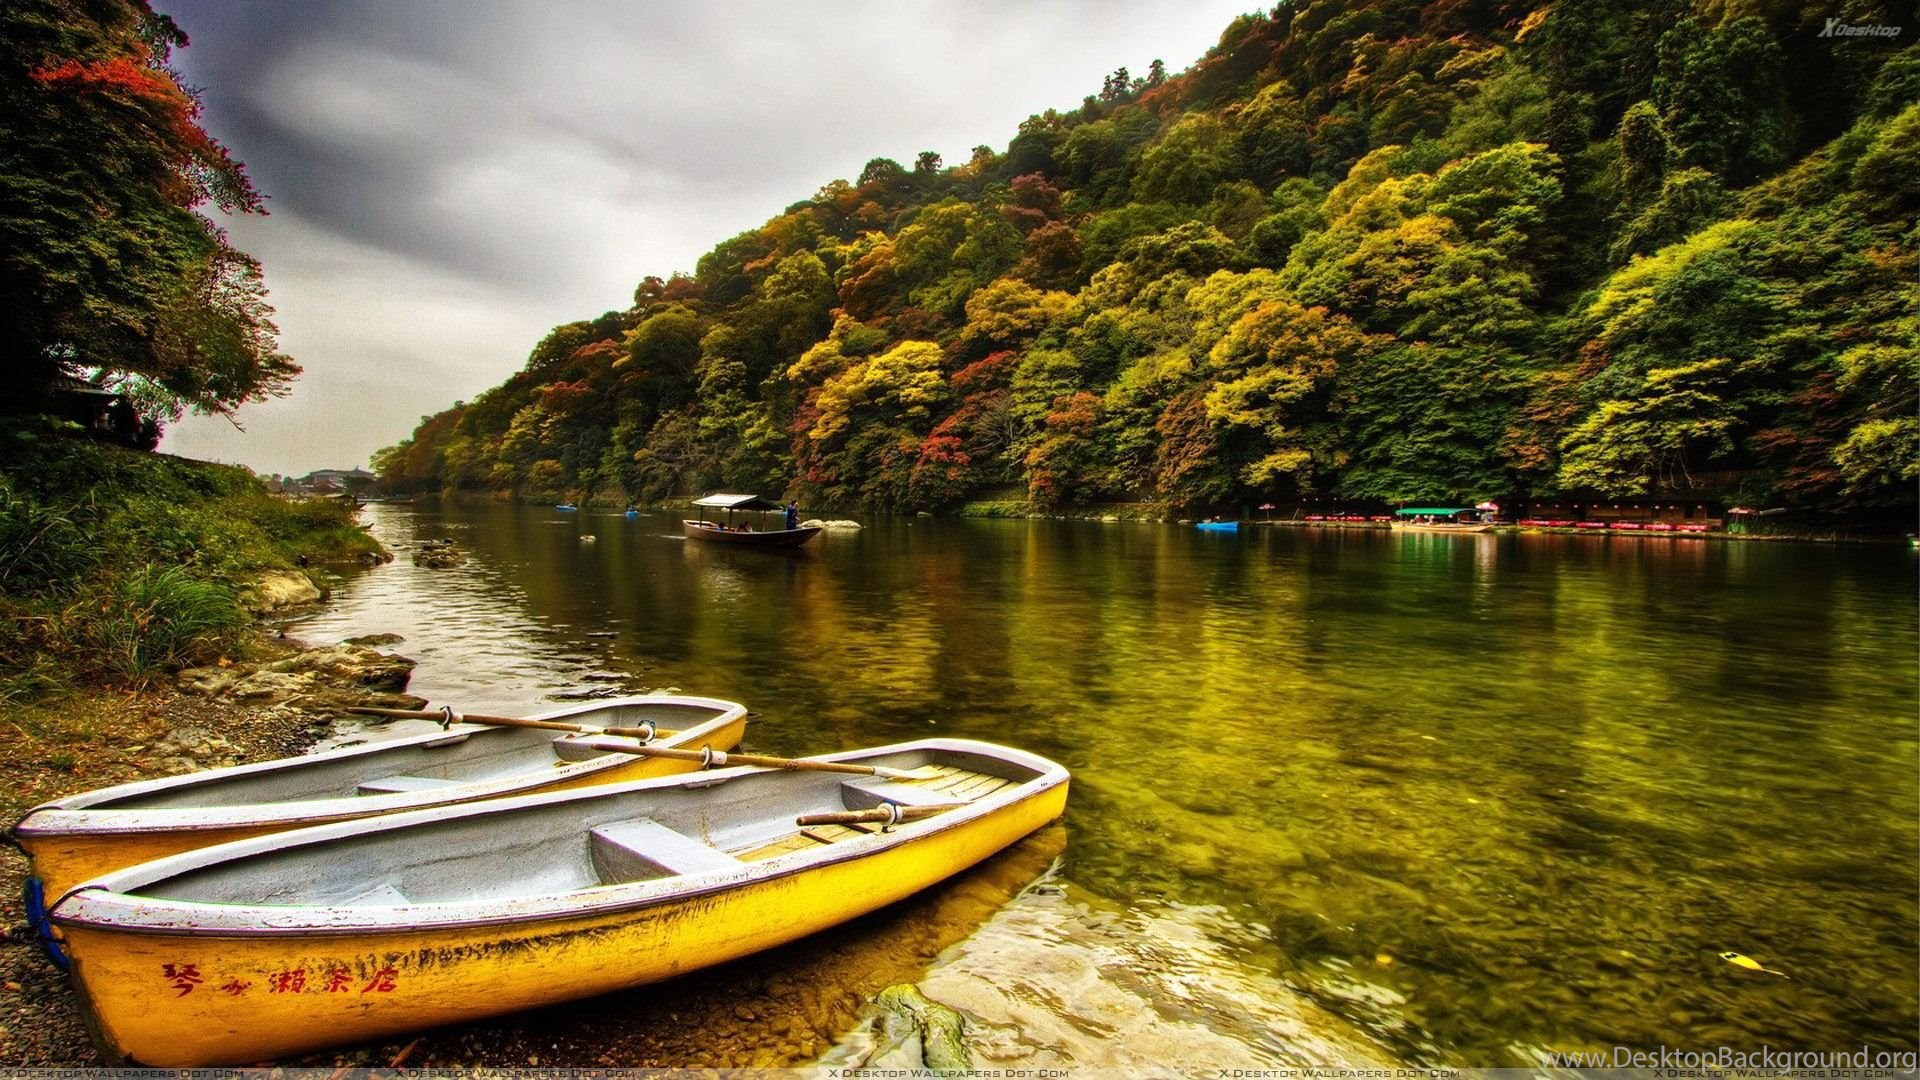 Nature Wallpaper: Beautiful 1080p Wallpapers HD Resolution